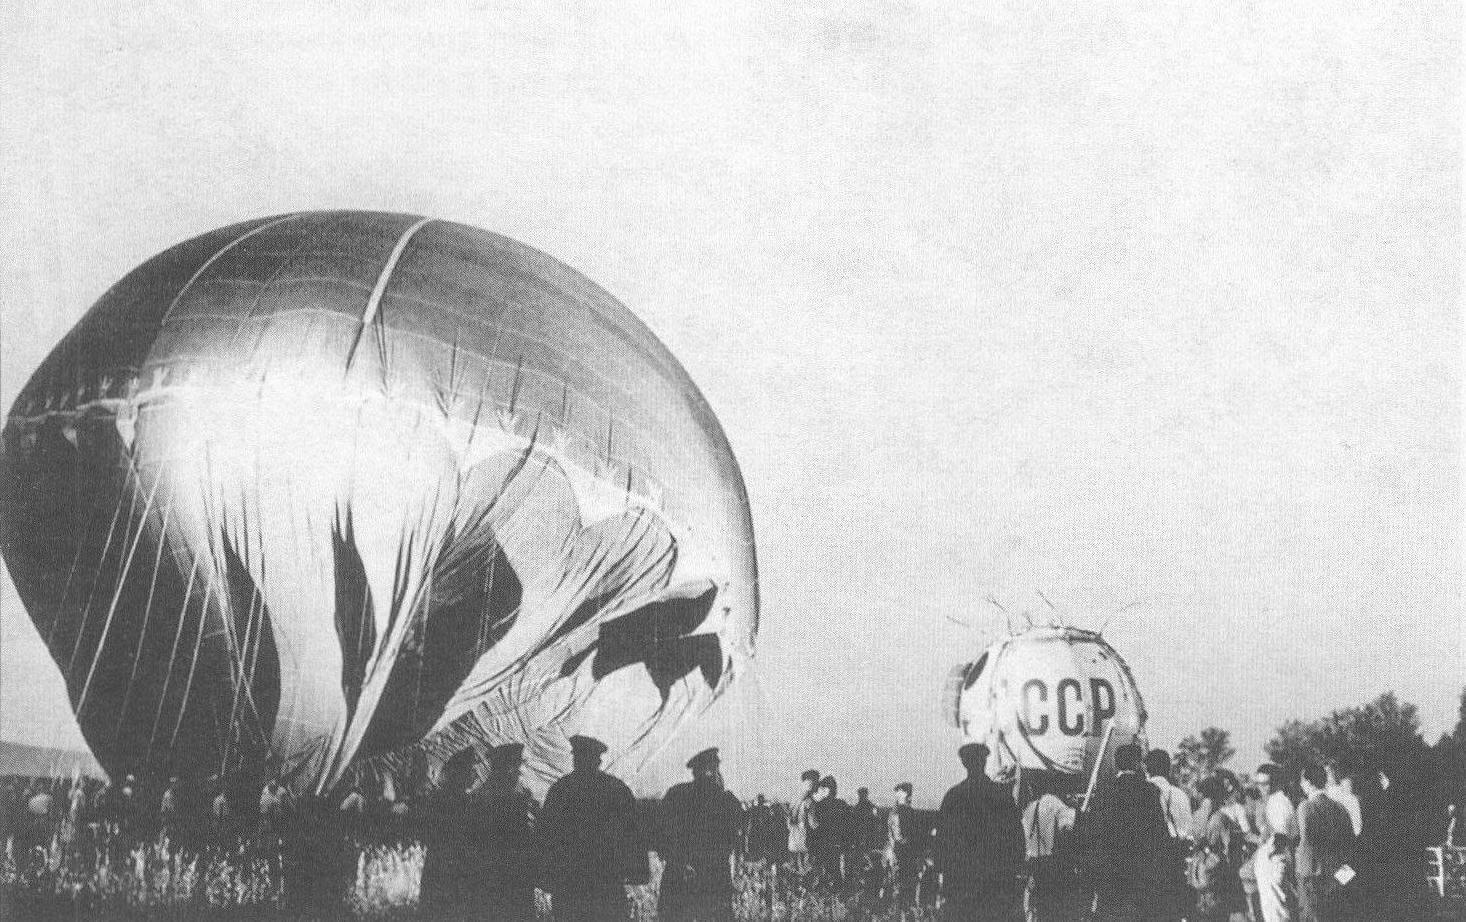 Наполнение водородом оболочки стратостата «СССР»